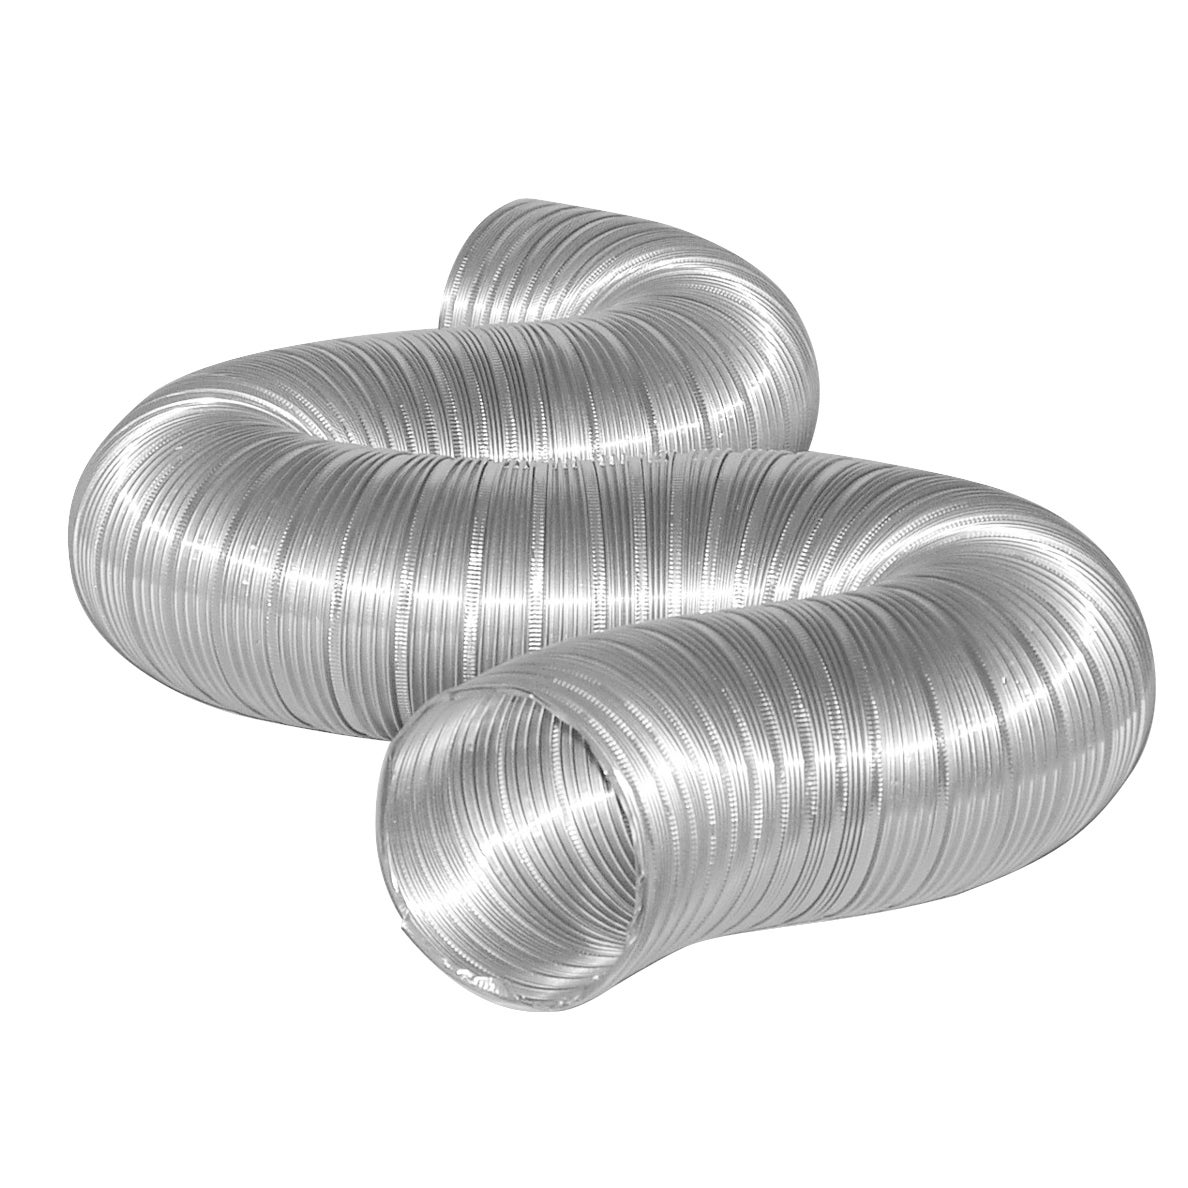 "Dundas Jafine MFX48X 4"" x 8' Semi Rigid Flexible Aluminum..."